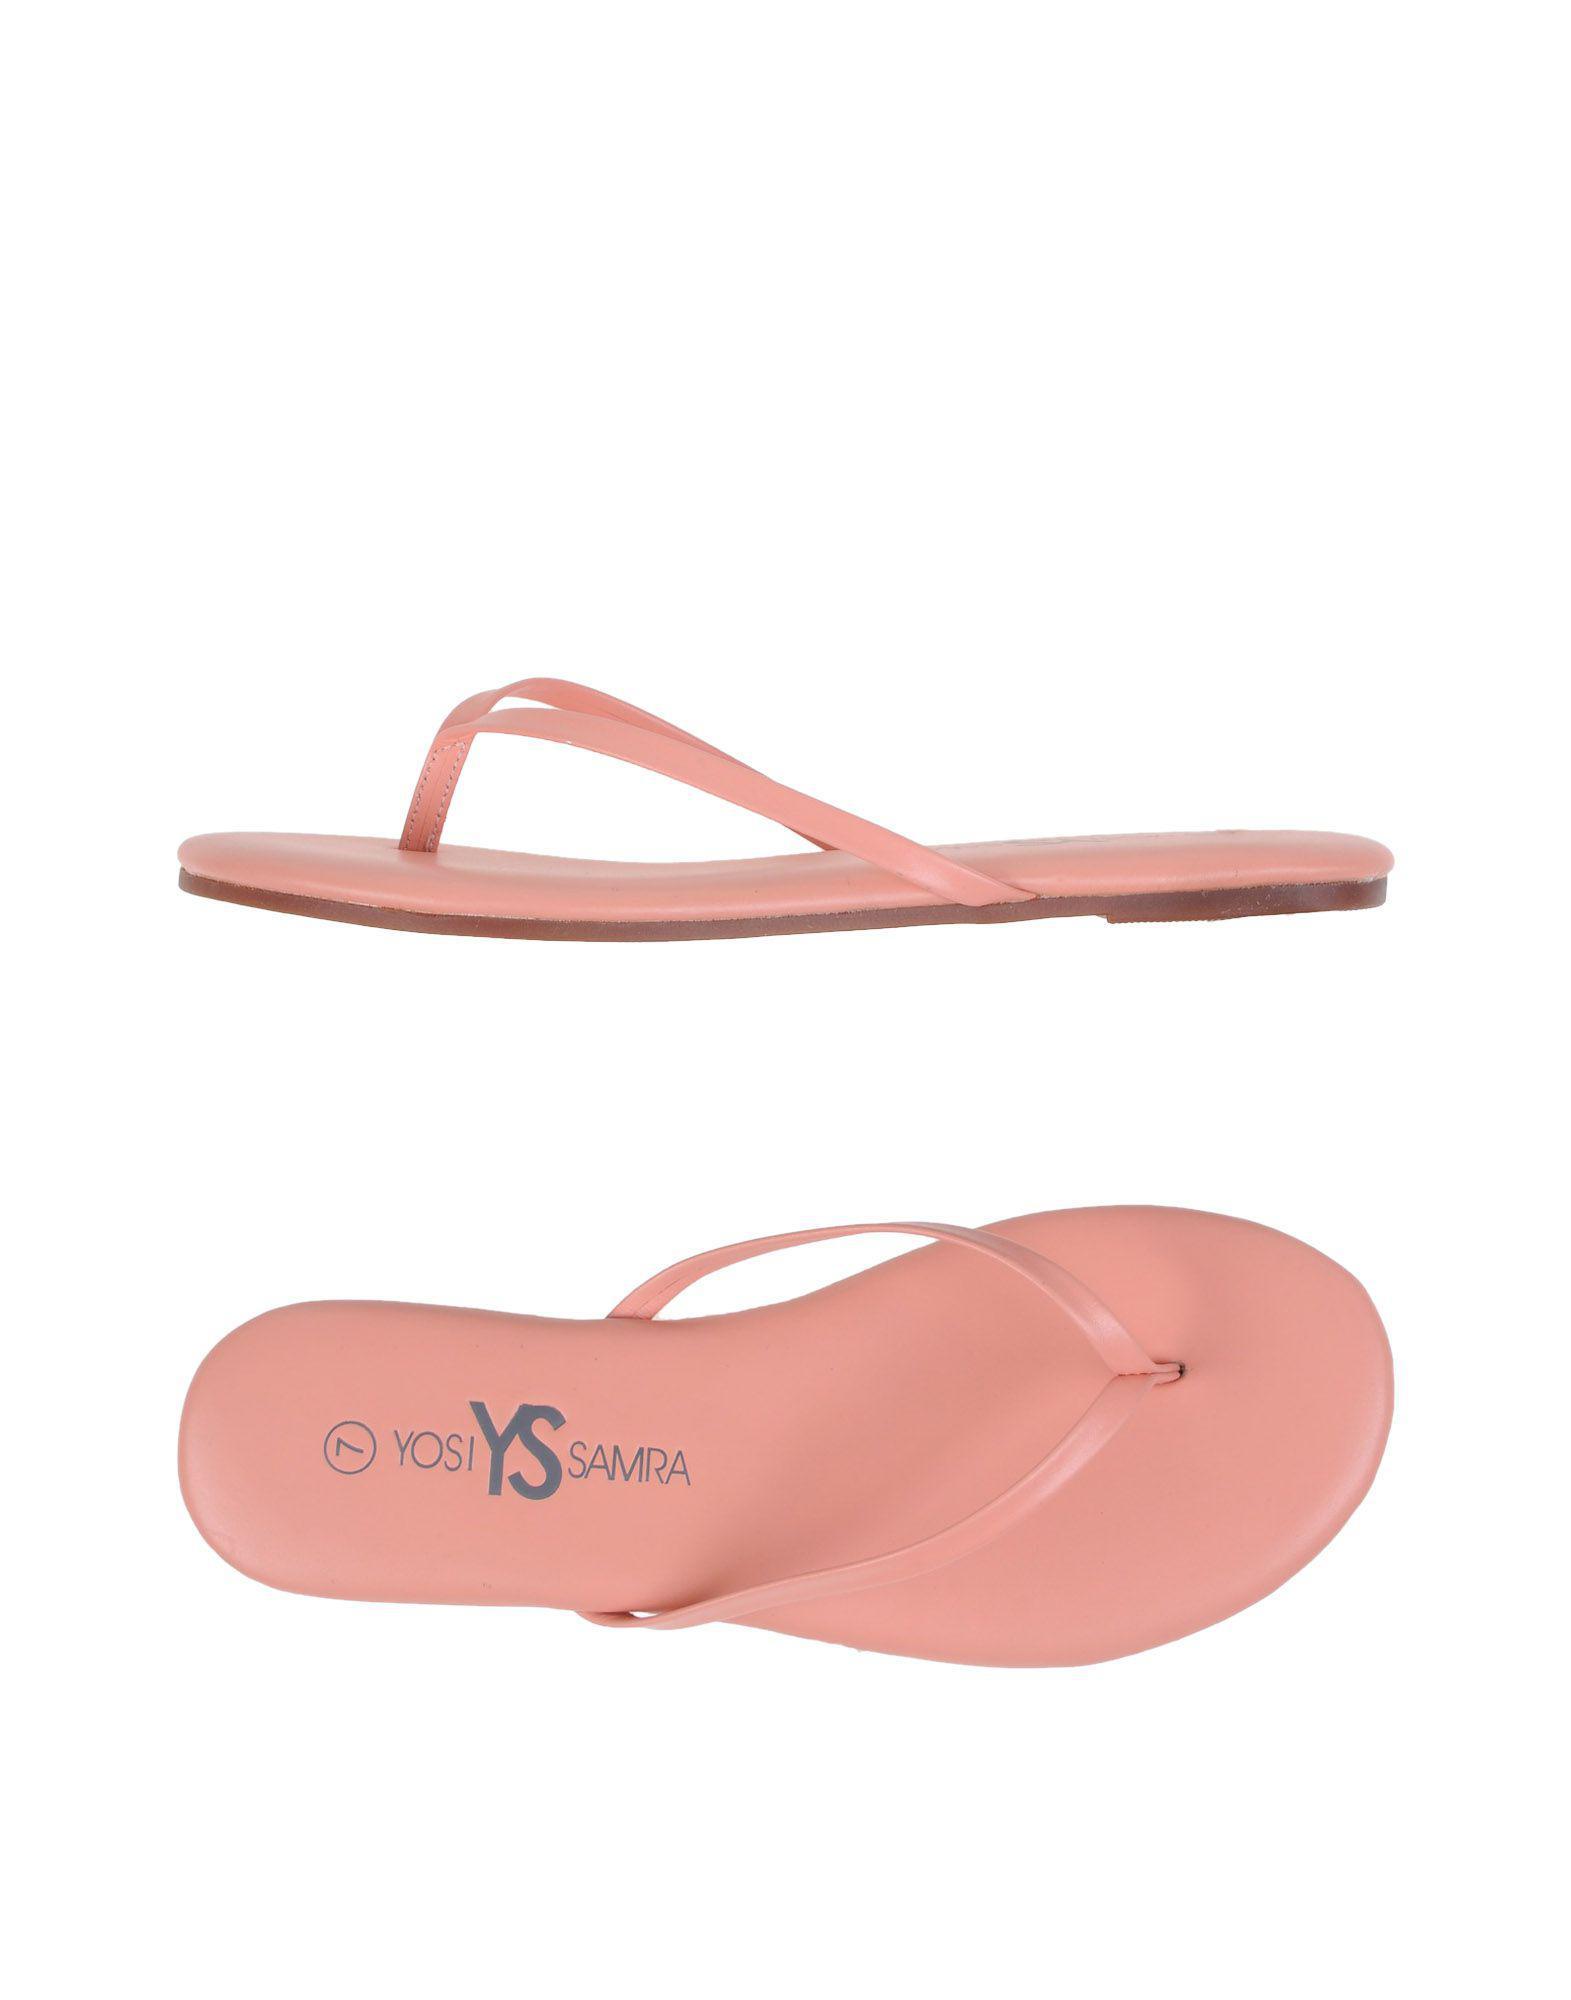 bd5bb37669dca Yosi Samra Toe Post Sandal in Pink - Lyst